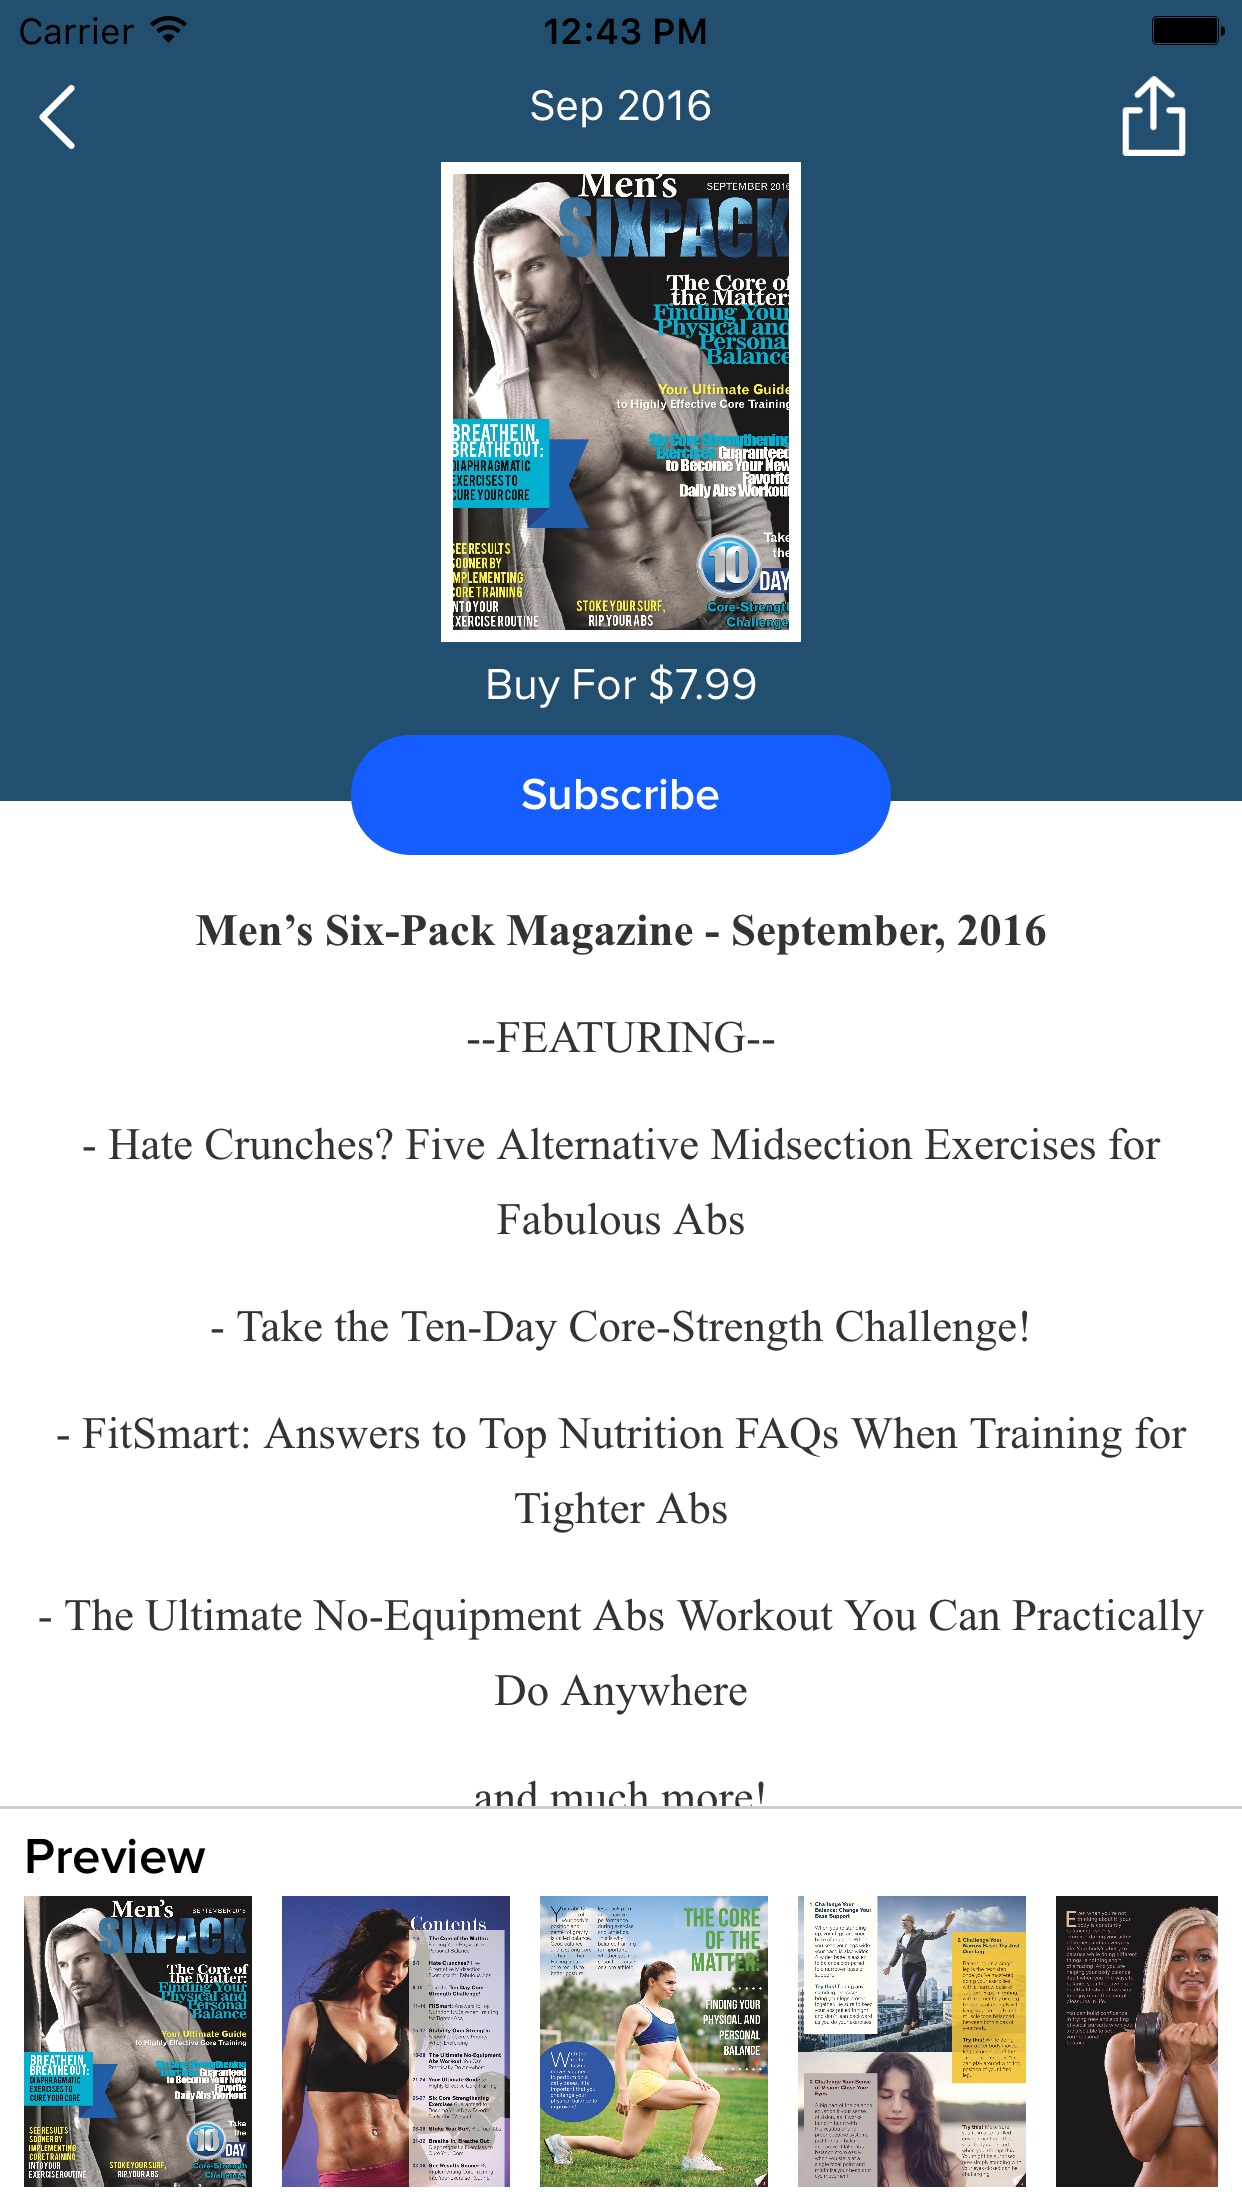 Men's Six Pack Magazine Screenshot